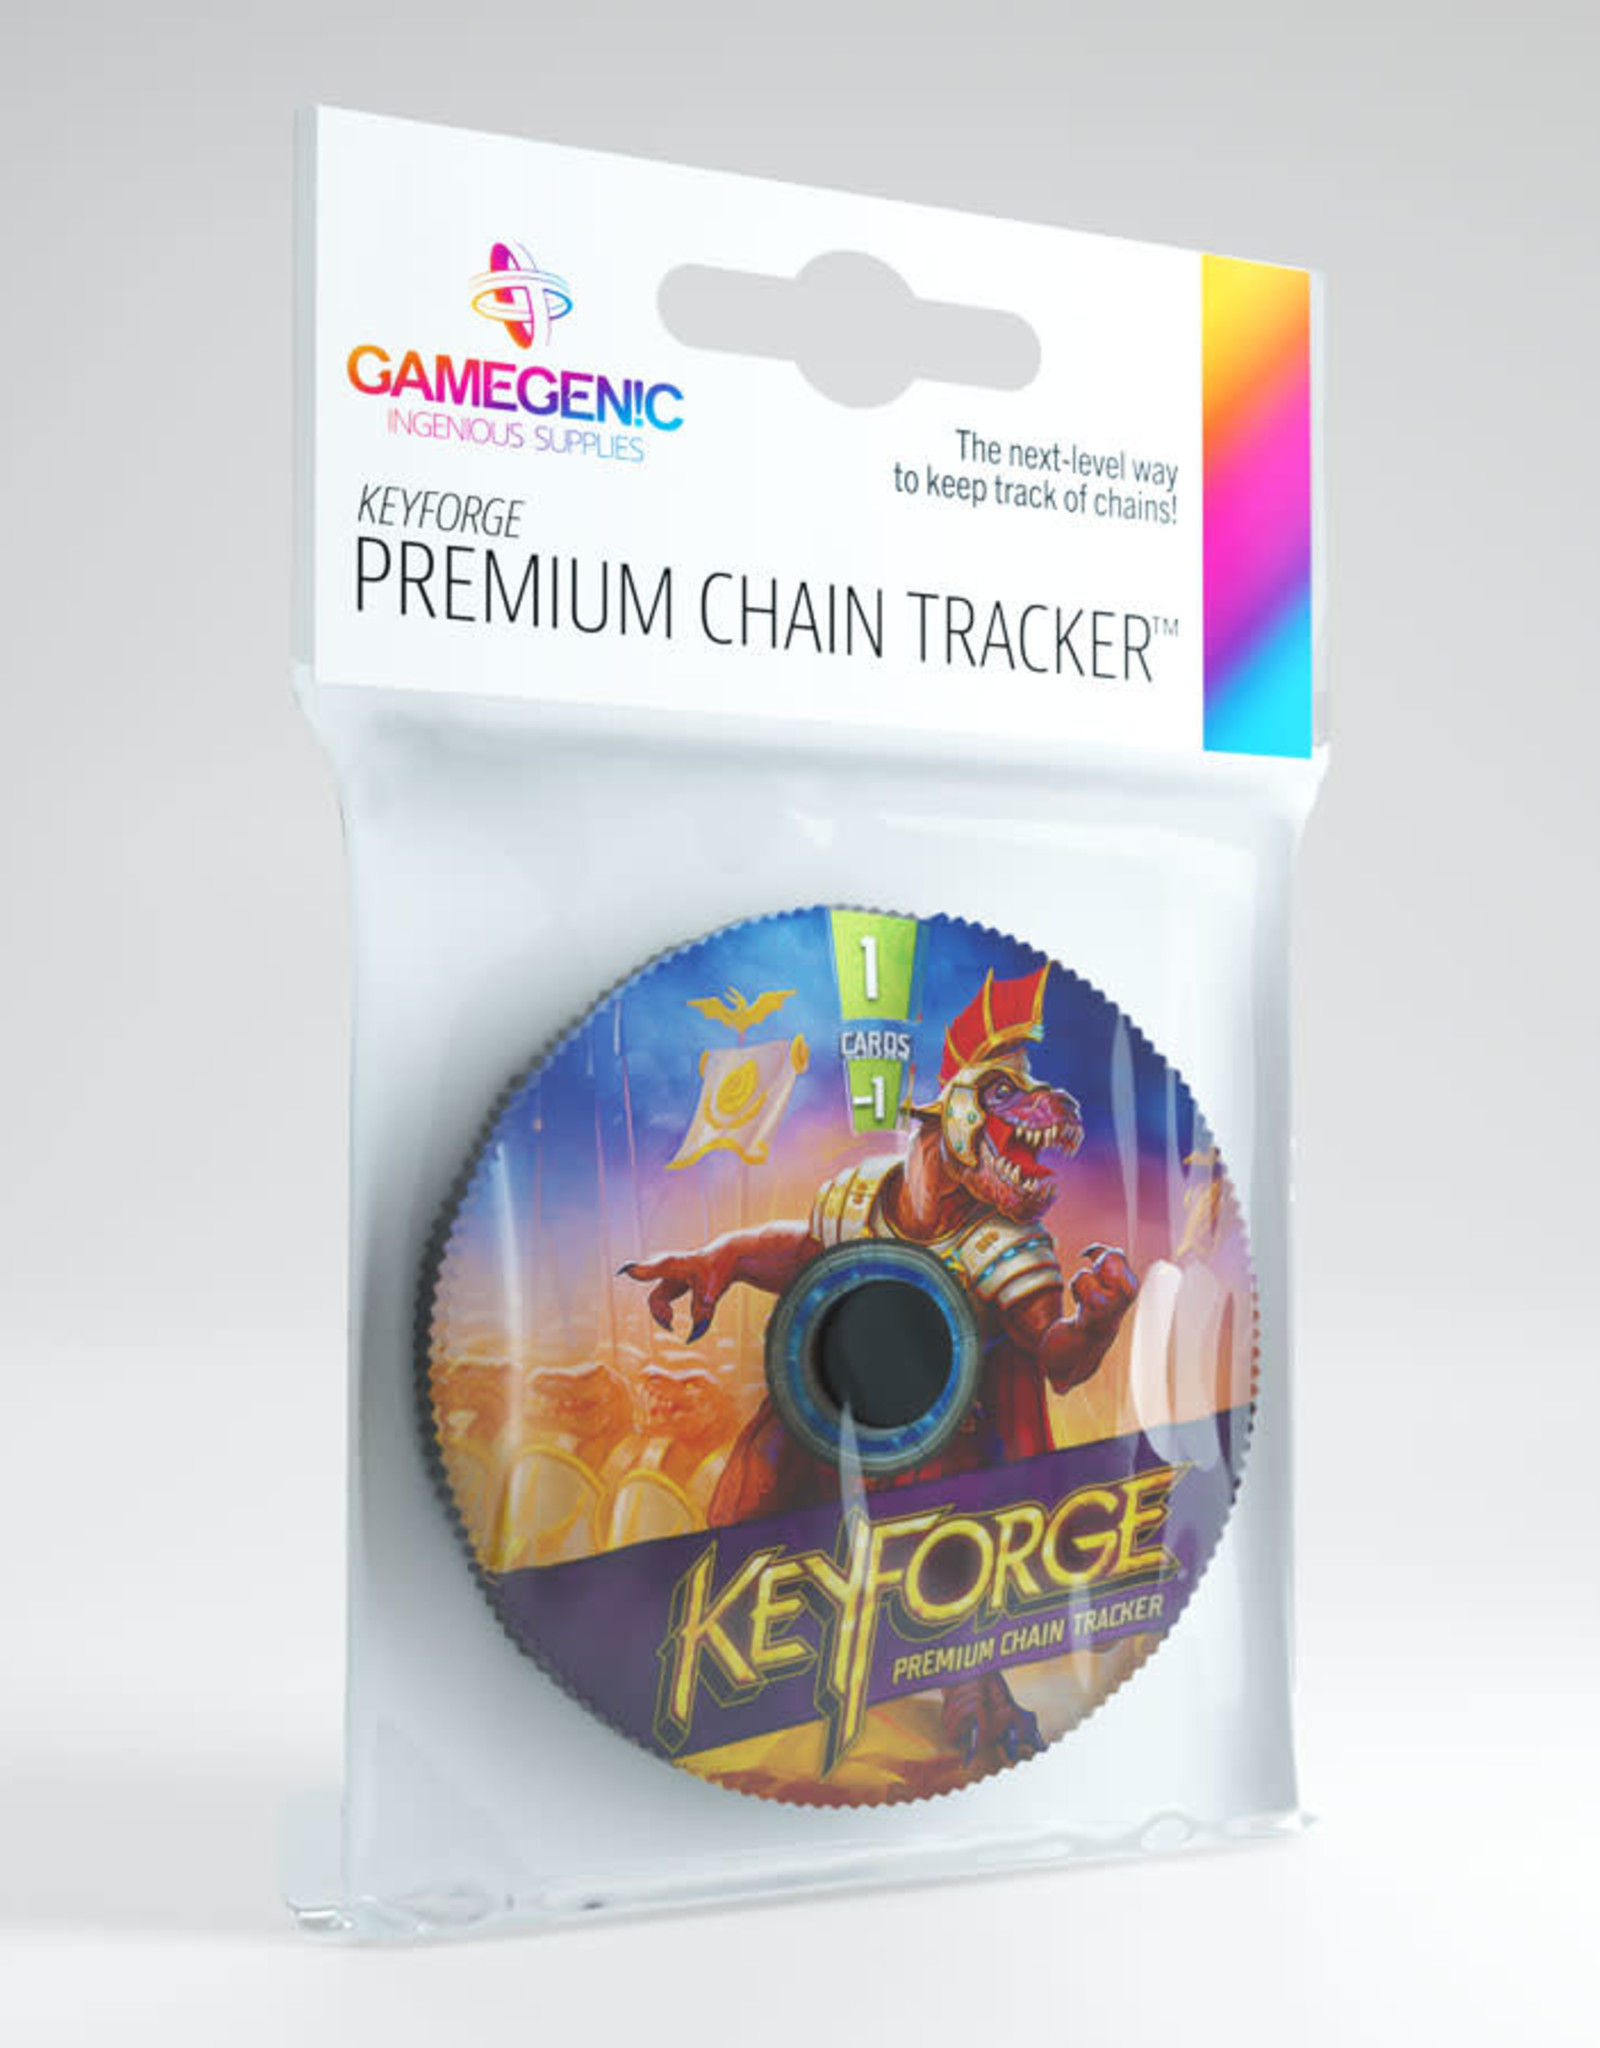 Keyforge Chain Tracker